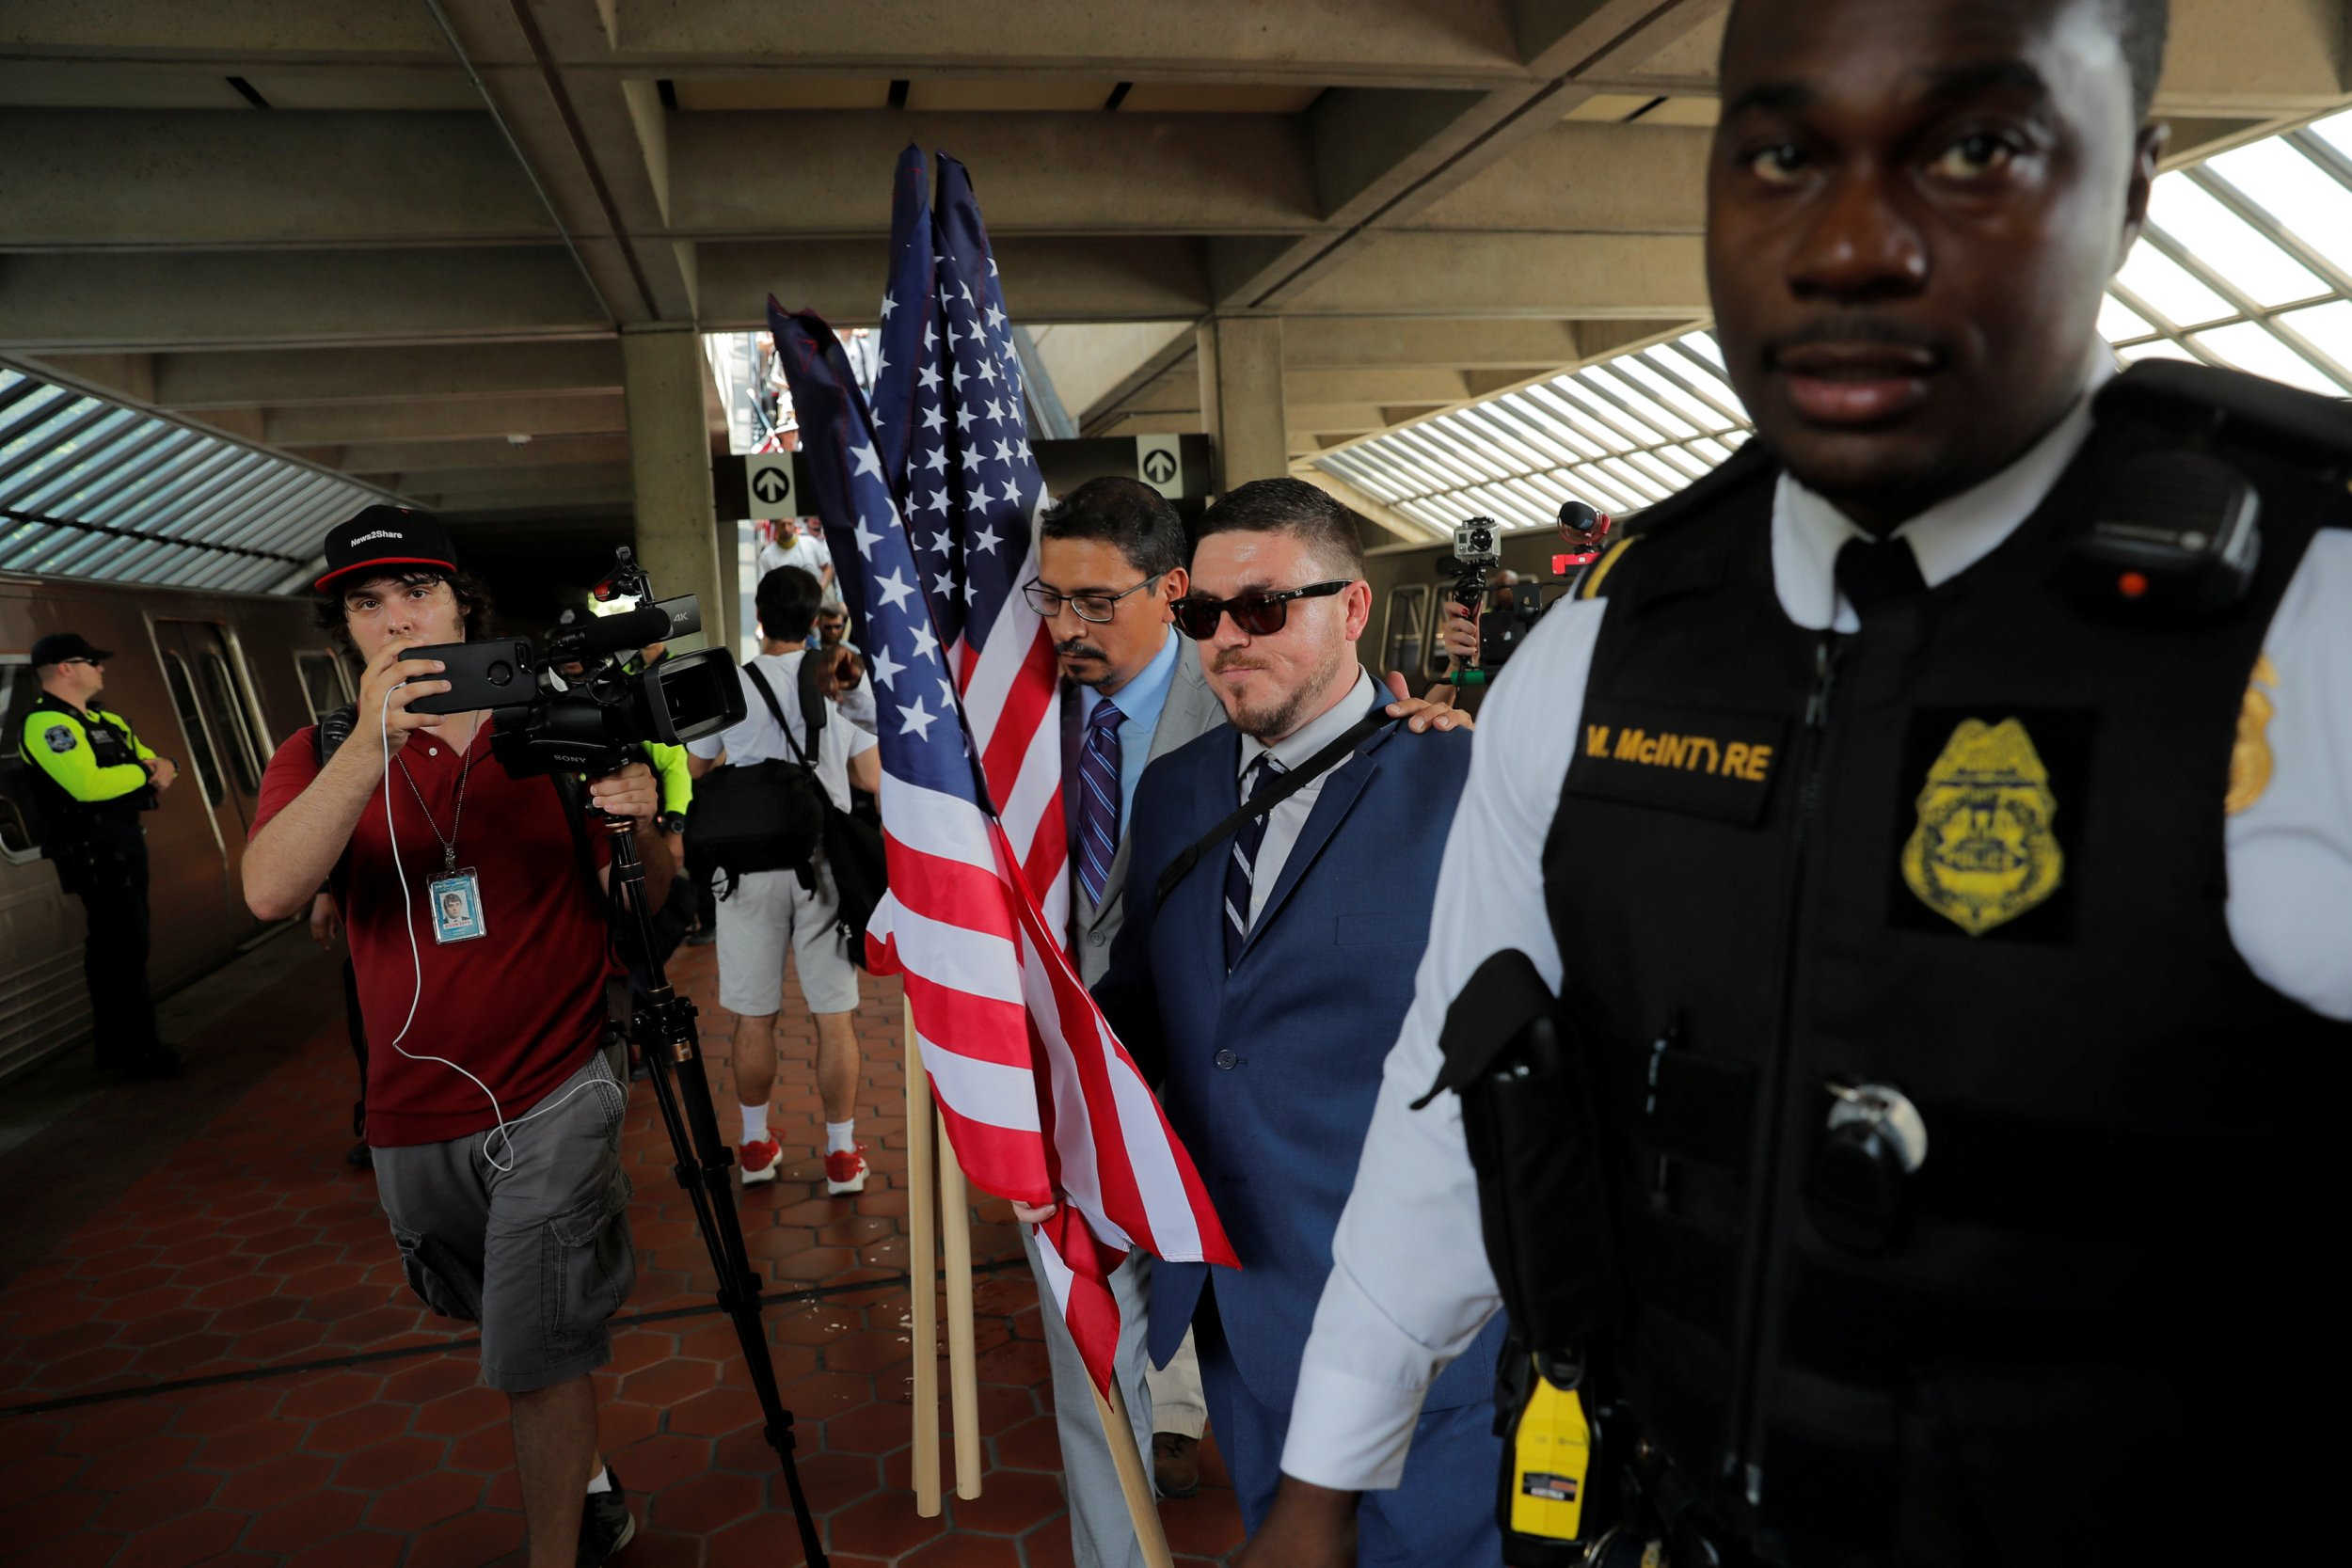 2018-08-12T185202Z_1_LYNXMPEE7B0K7_RTROPTP_4_USA-PROTESTS